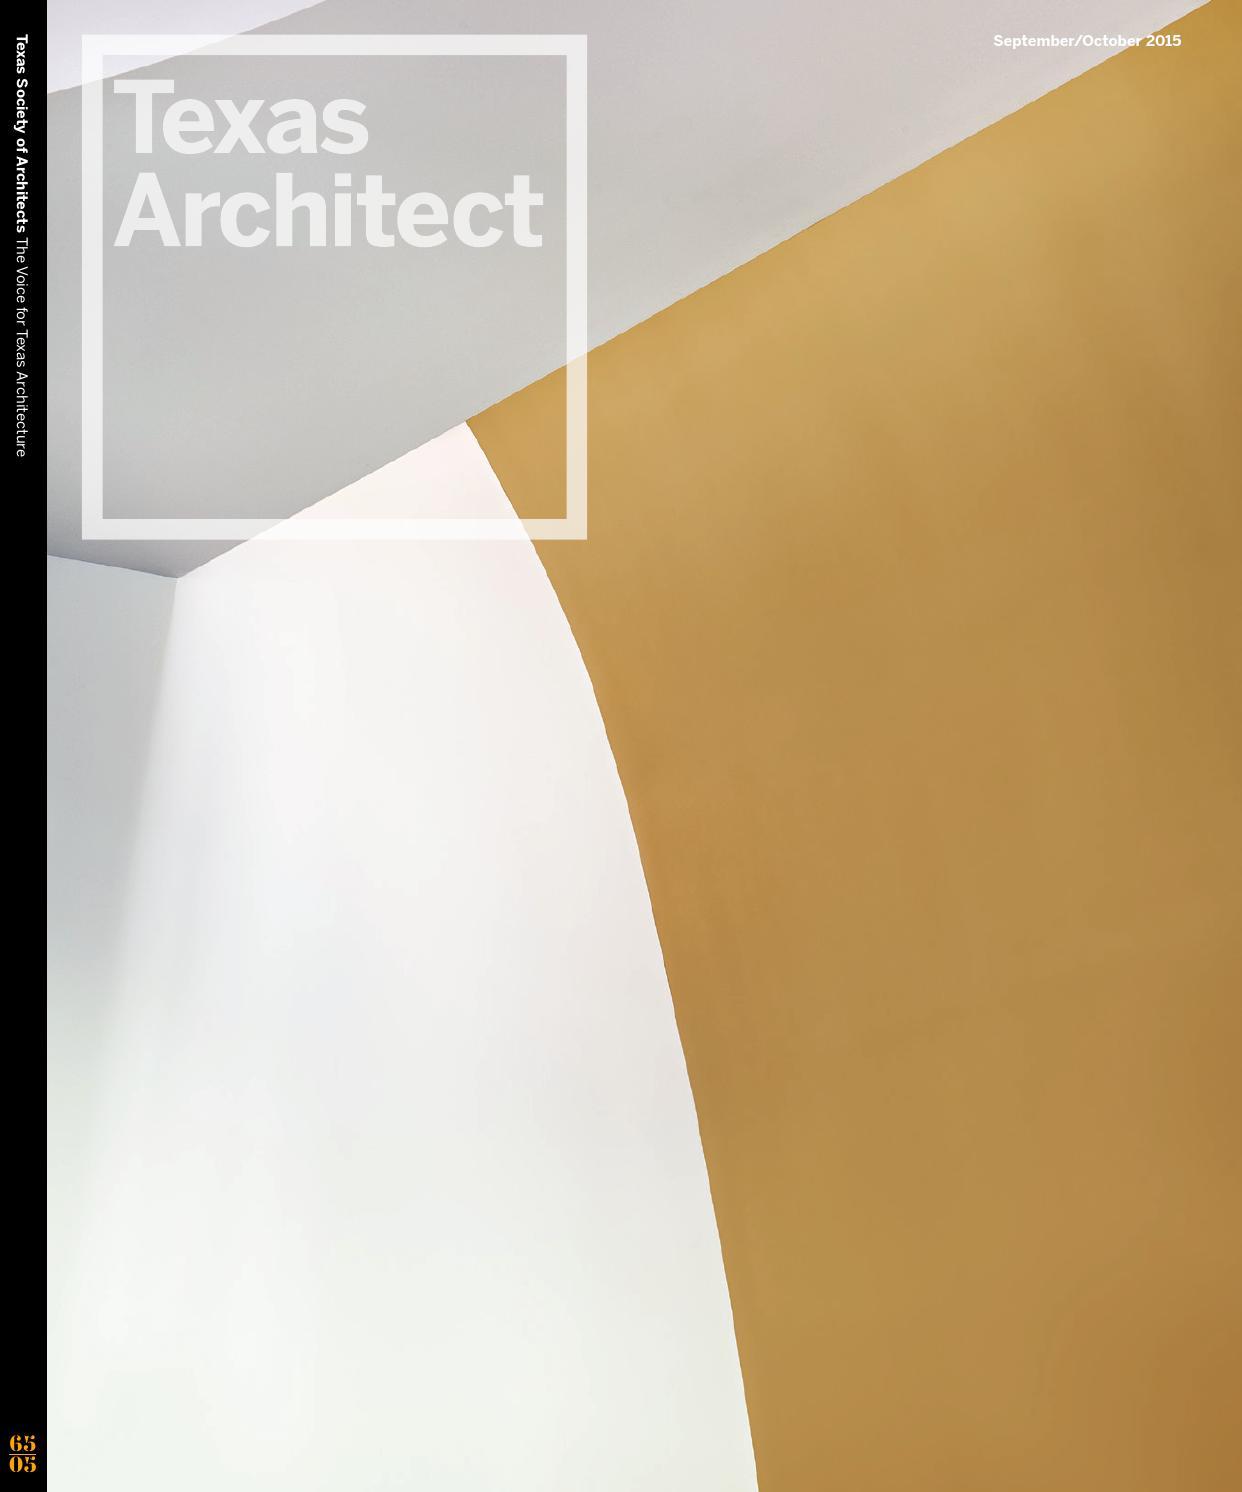 Texas Architect September/October 2015: Design Awards